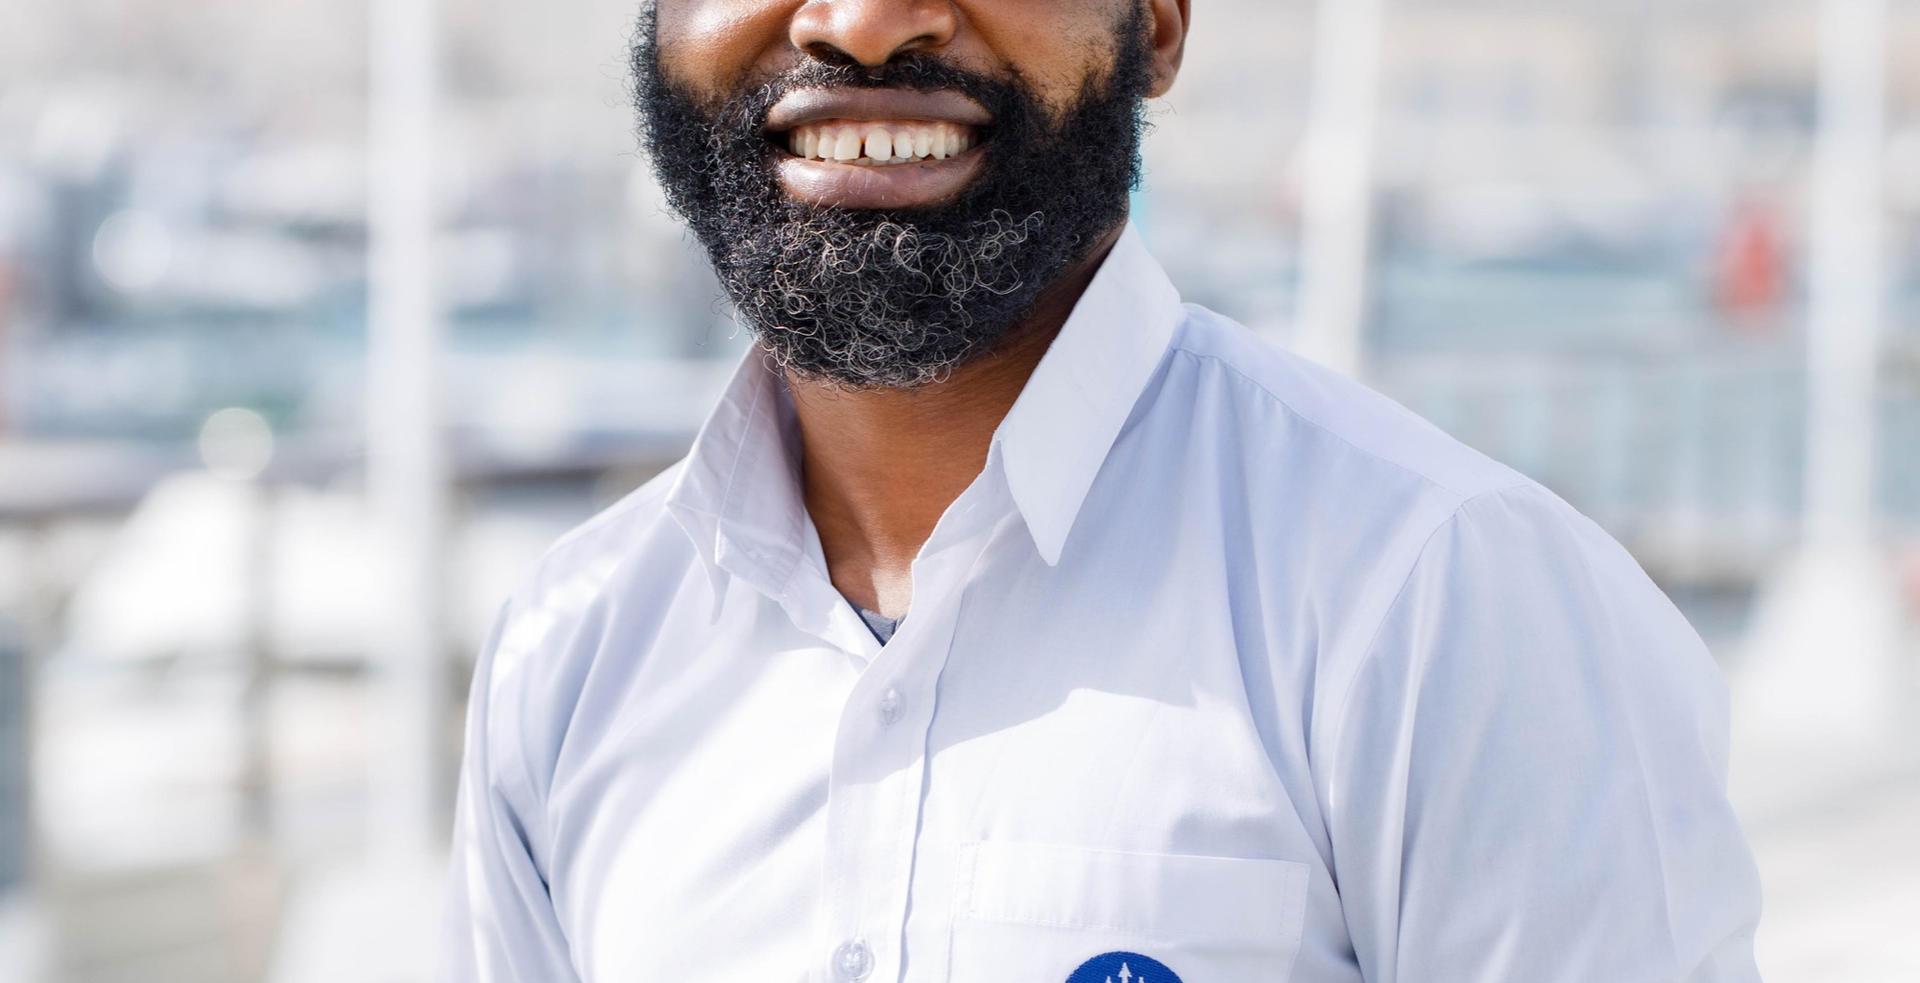 Oluwasegun Samson Akinsimoye